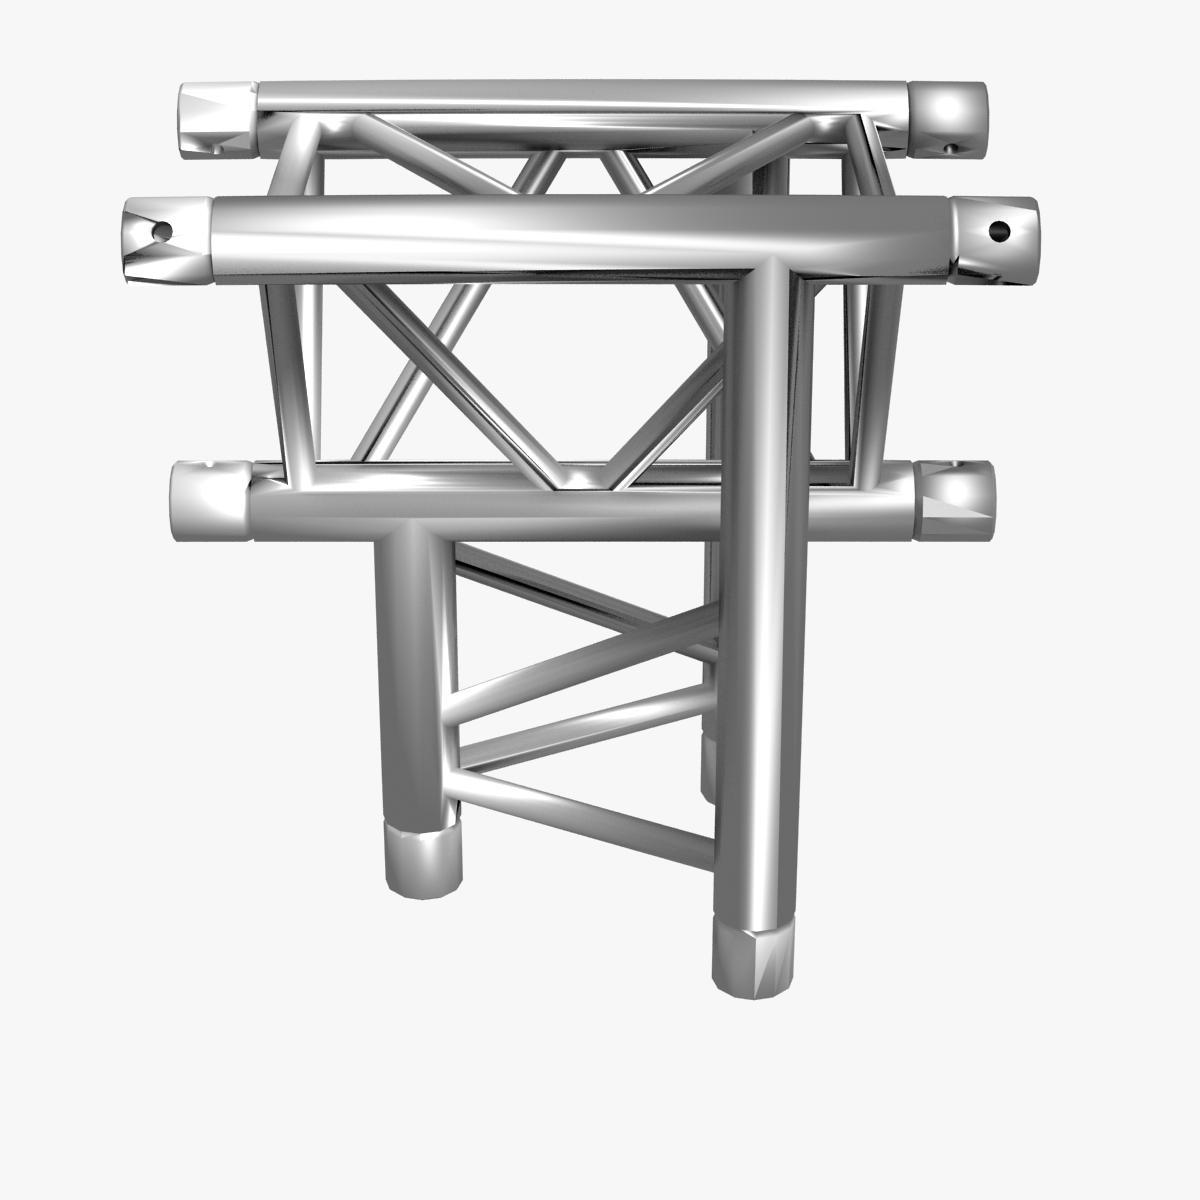 triangular trusses (collection 55 modular pieces) 3d model 3ds max dxf fbx c4d dae texture obj 216221